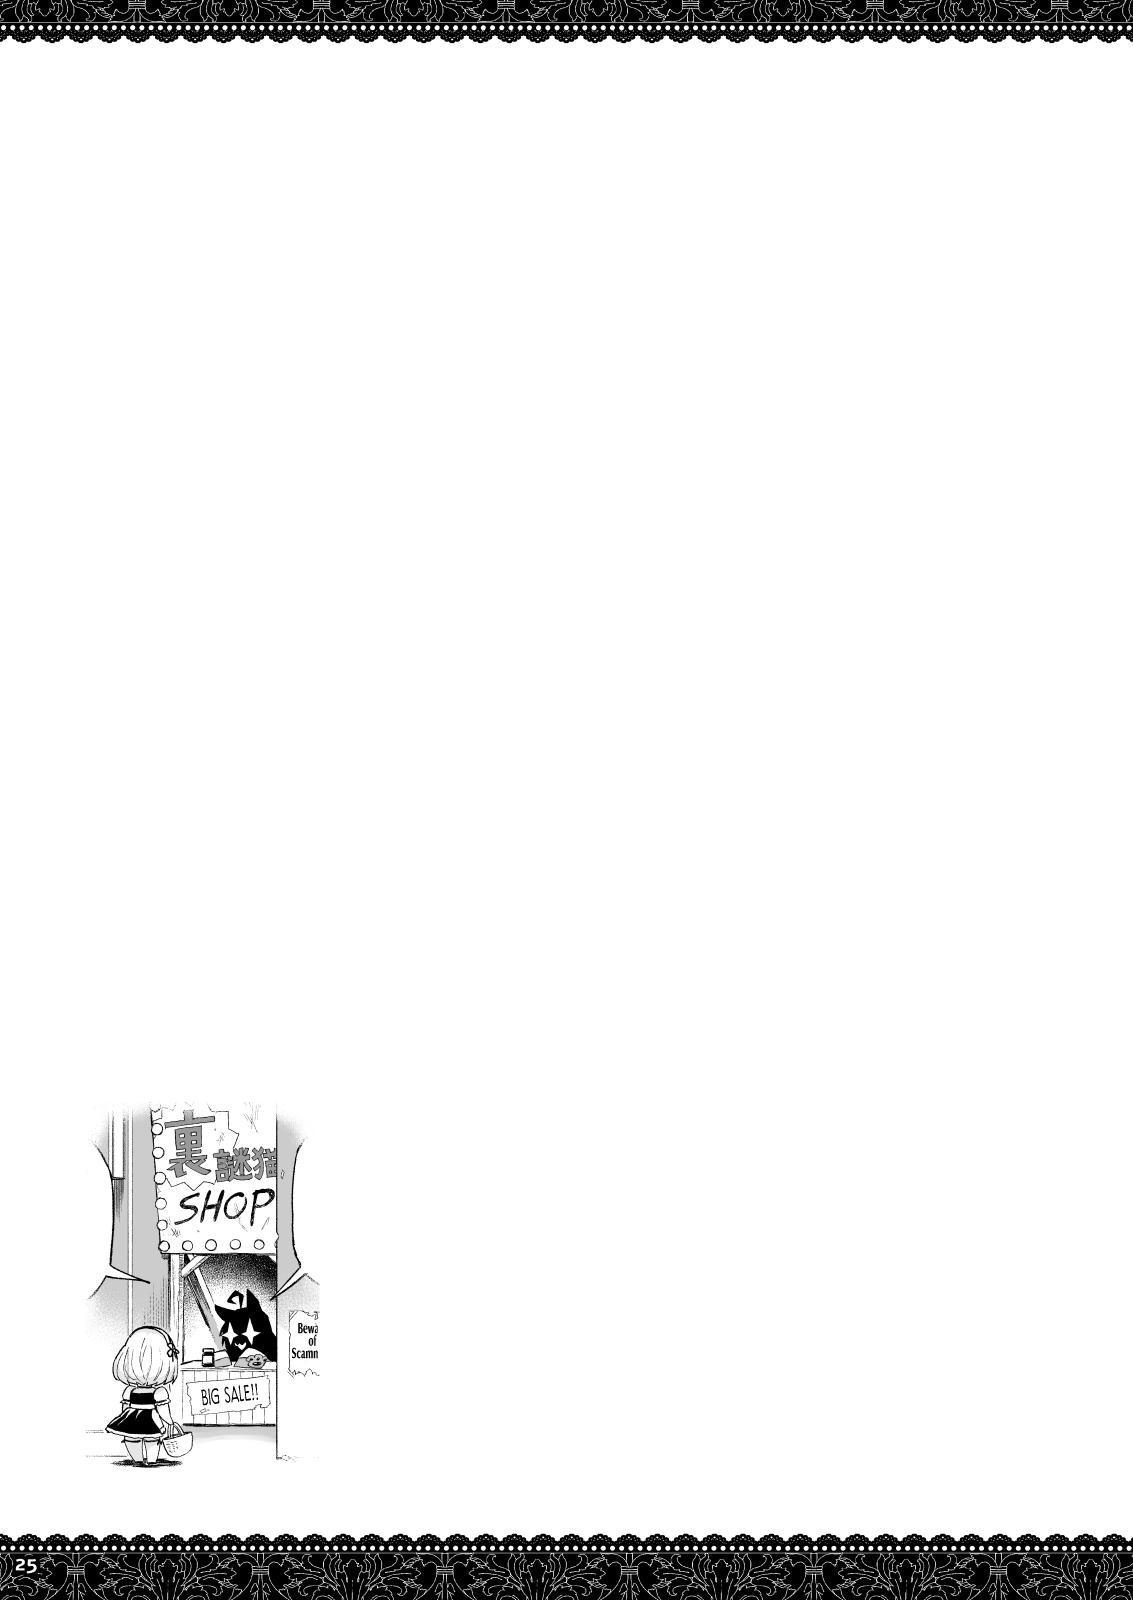 [Nihohuhehon (Supurai)] WhiteBrim Royal Maid-tai no Kenshin-Tekina Aijou o Zonbun ni Ajiwau Hon | WhiteBrim: An Appreciation Book to The Devoted Love of Royal Maid Corp (Azur Lane) [English] [Night Revenants] [Digital] 23